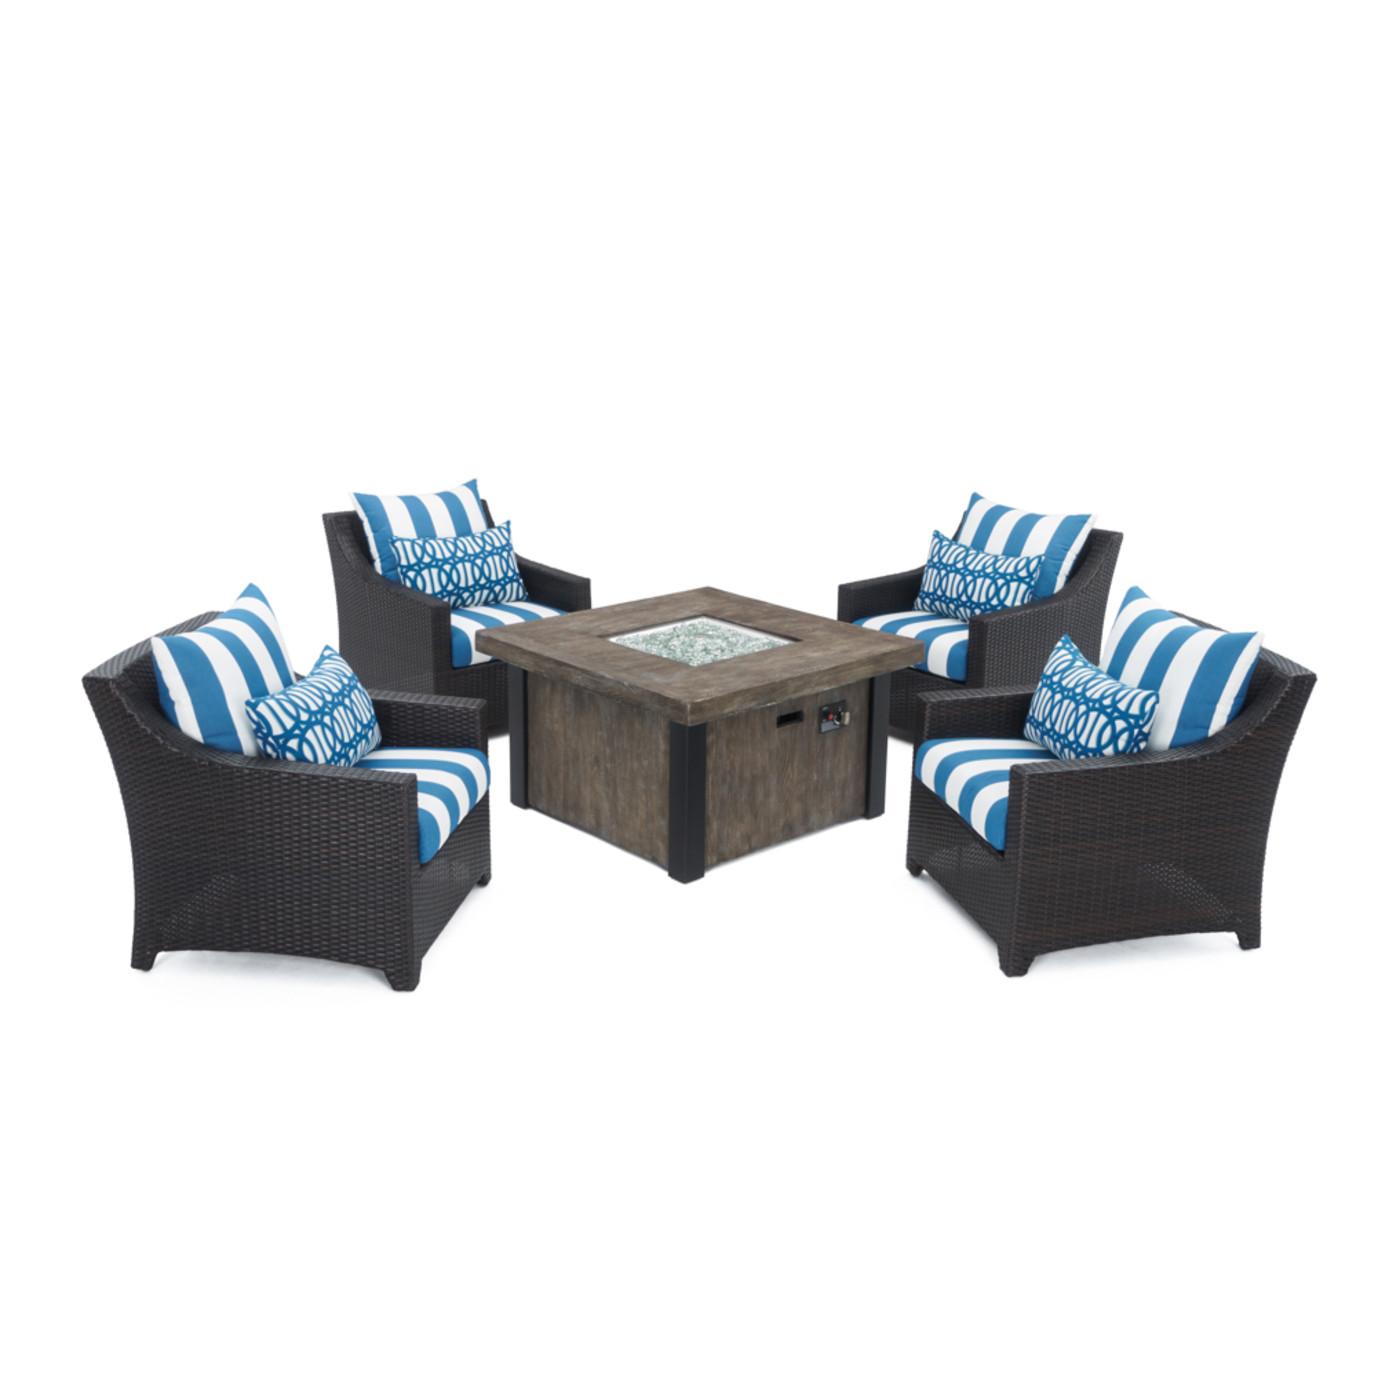 Deco™ 5pc Fire Chat Set - Regatta Blue